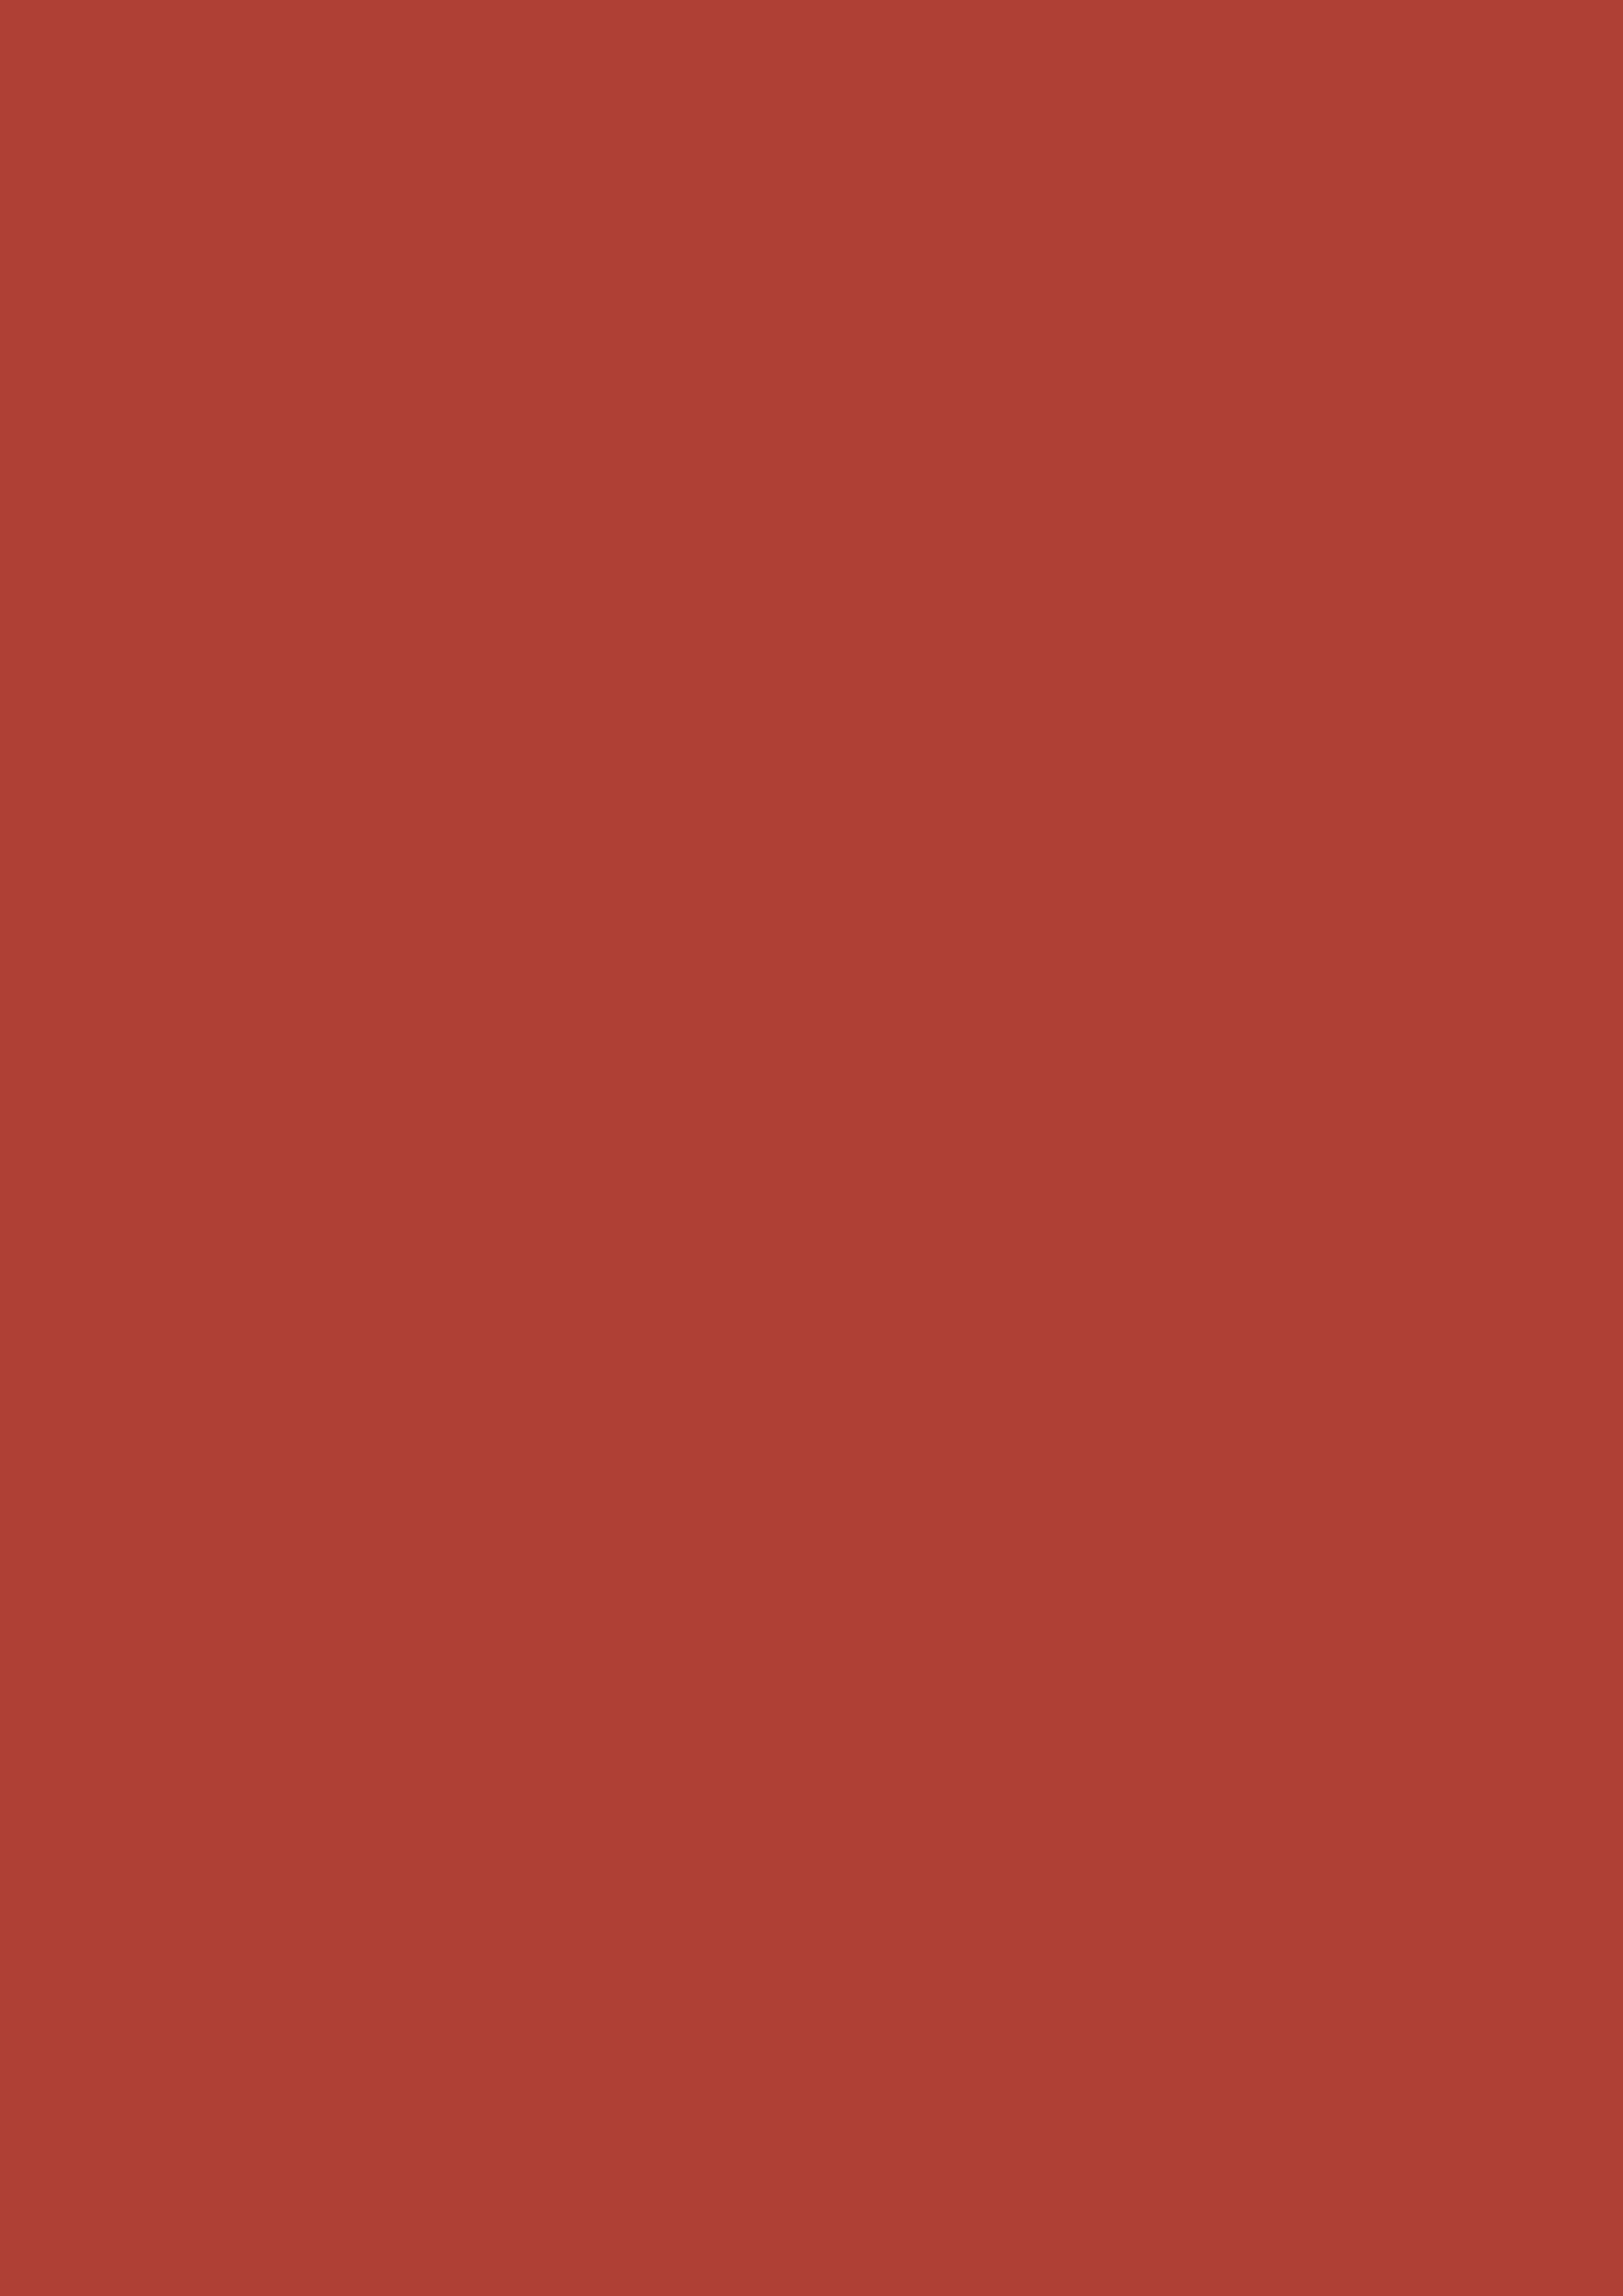 2480x3508 Medium Carmine Solid Color Background